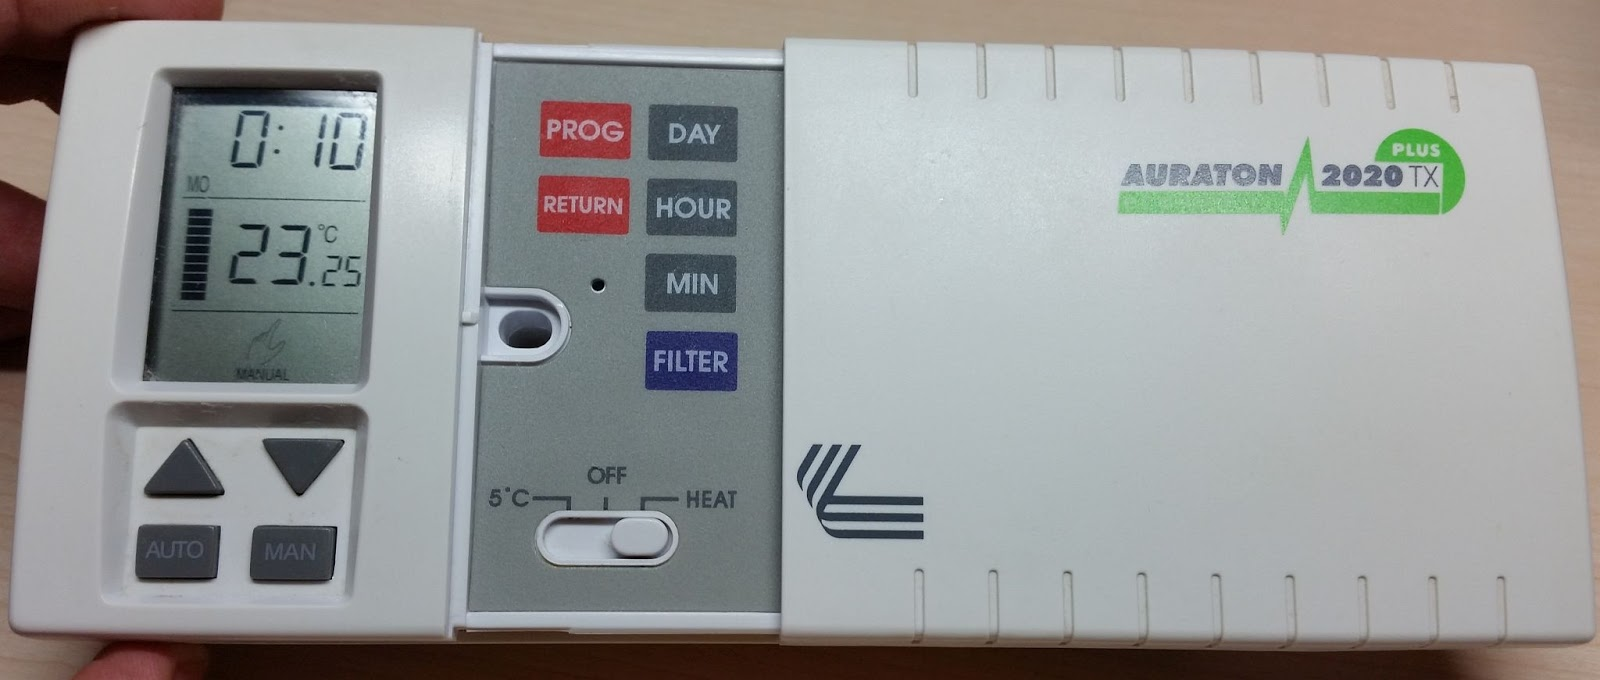 Hack Correlation: Inside stuff - Auraton 2020 TX/RX thermostat